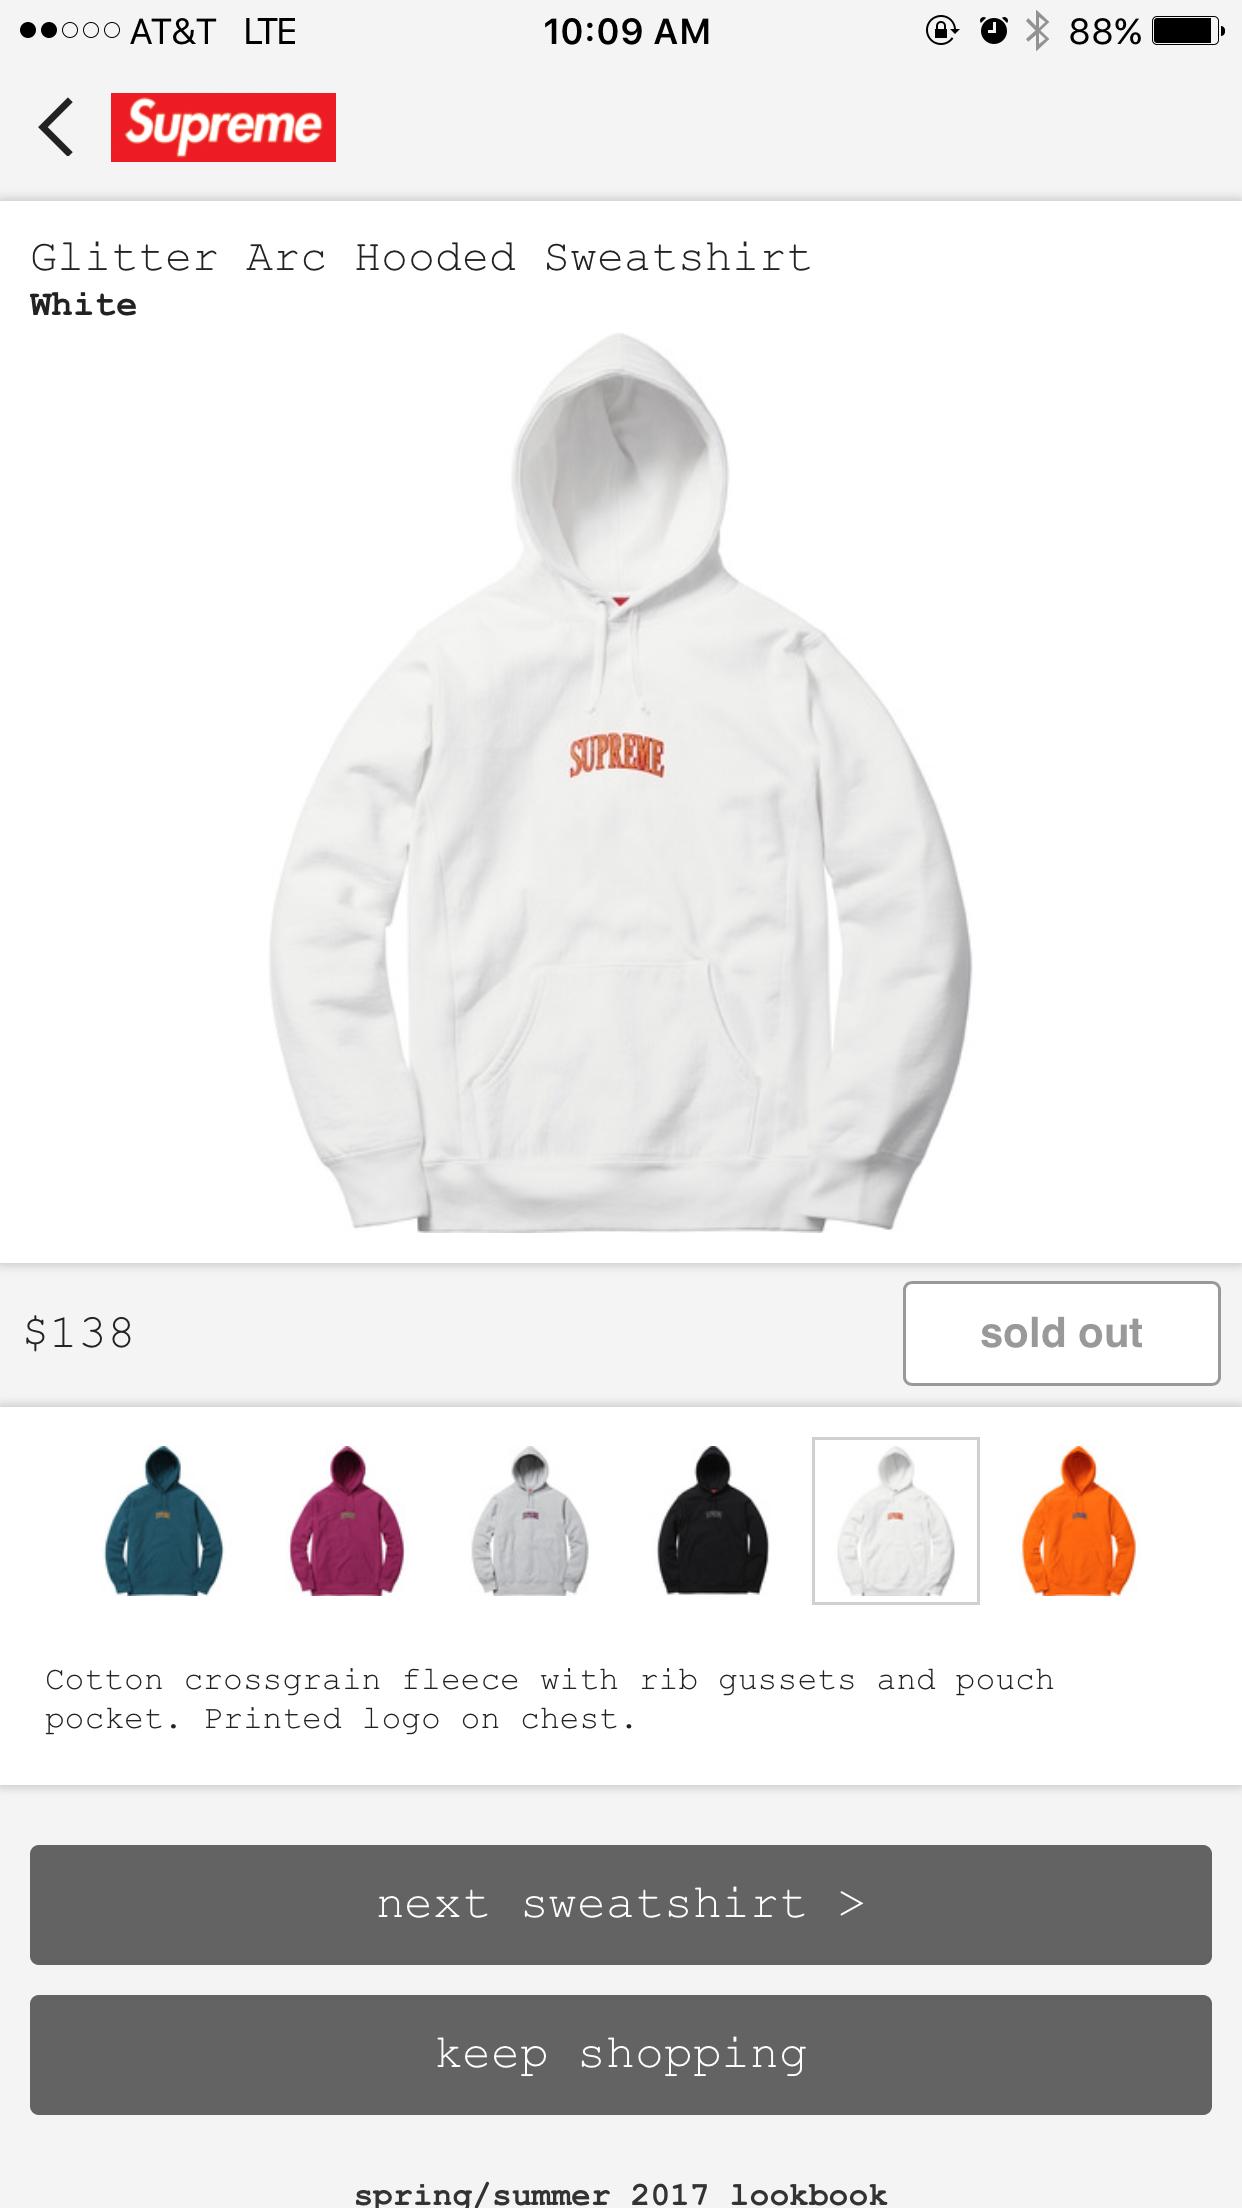 Supreme Glitter Arc Hoodie White Sweatshirt Hoodies Hooded Sweatshirts [ 2208 x 1242 Pixel ]